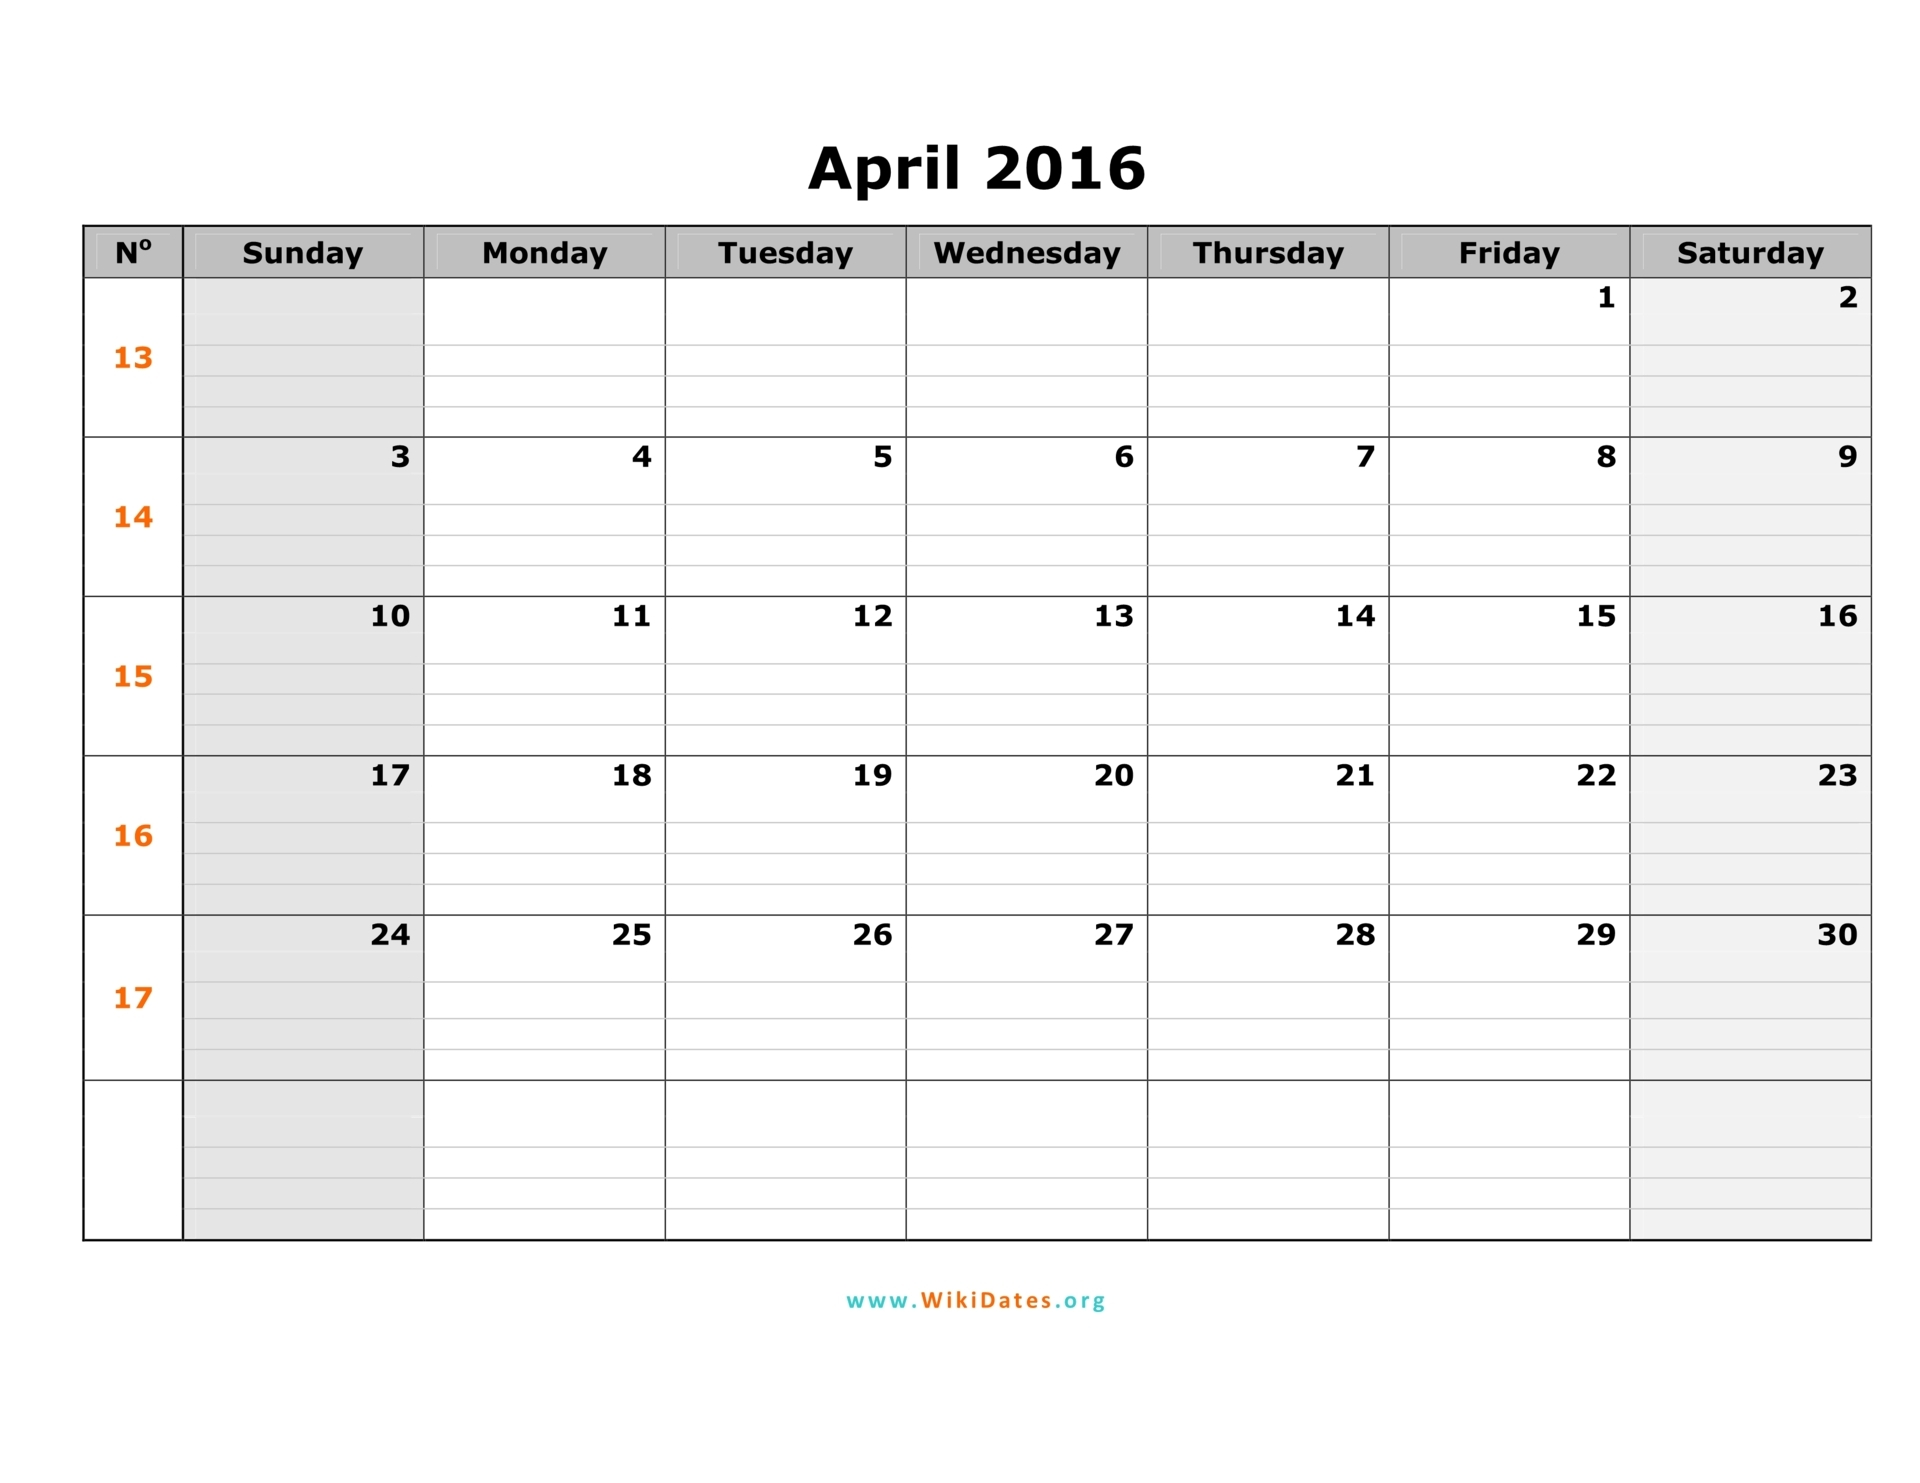 April 2016 Calendar   WikiDates.org